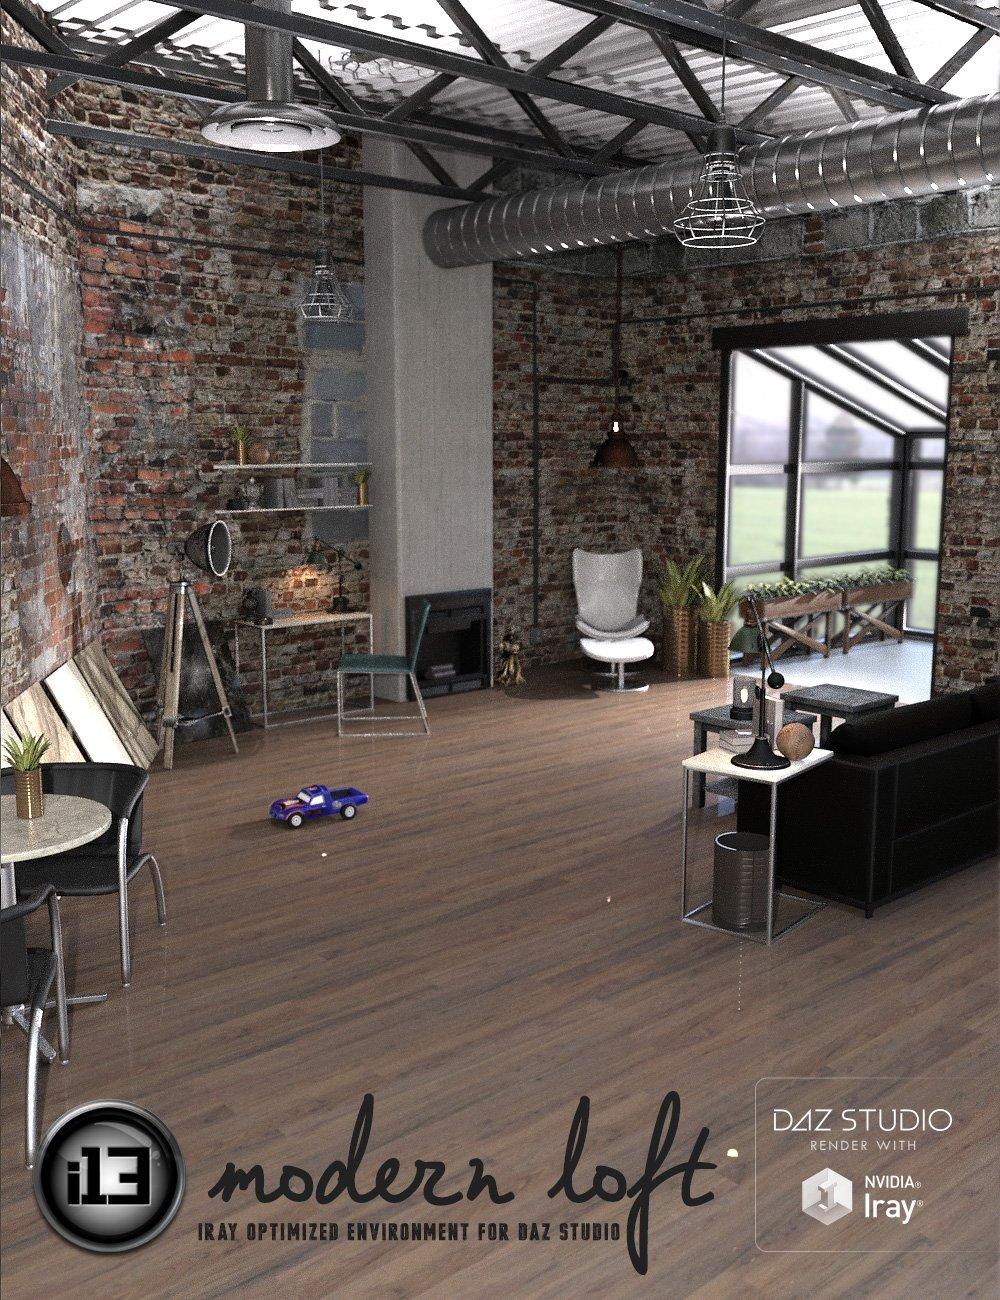 i13 Modern Loft by: ironman13, 3D Models by Daz 3D